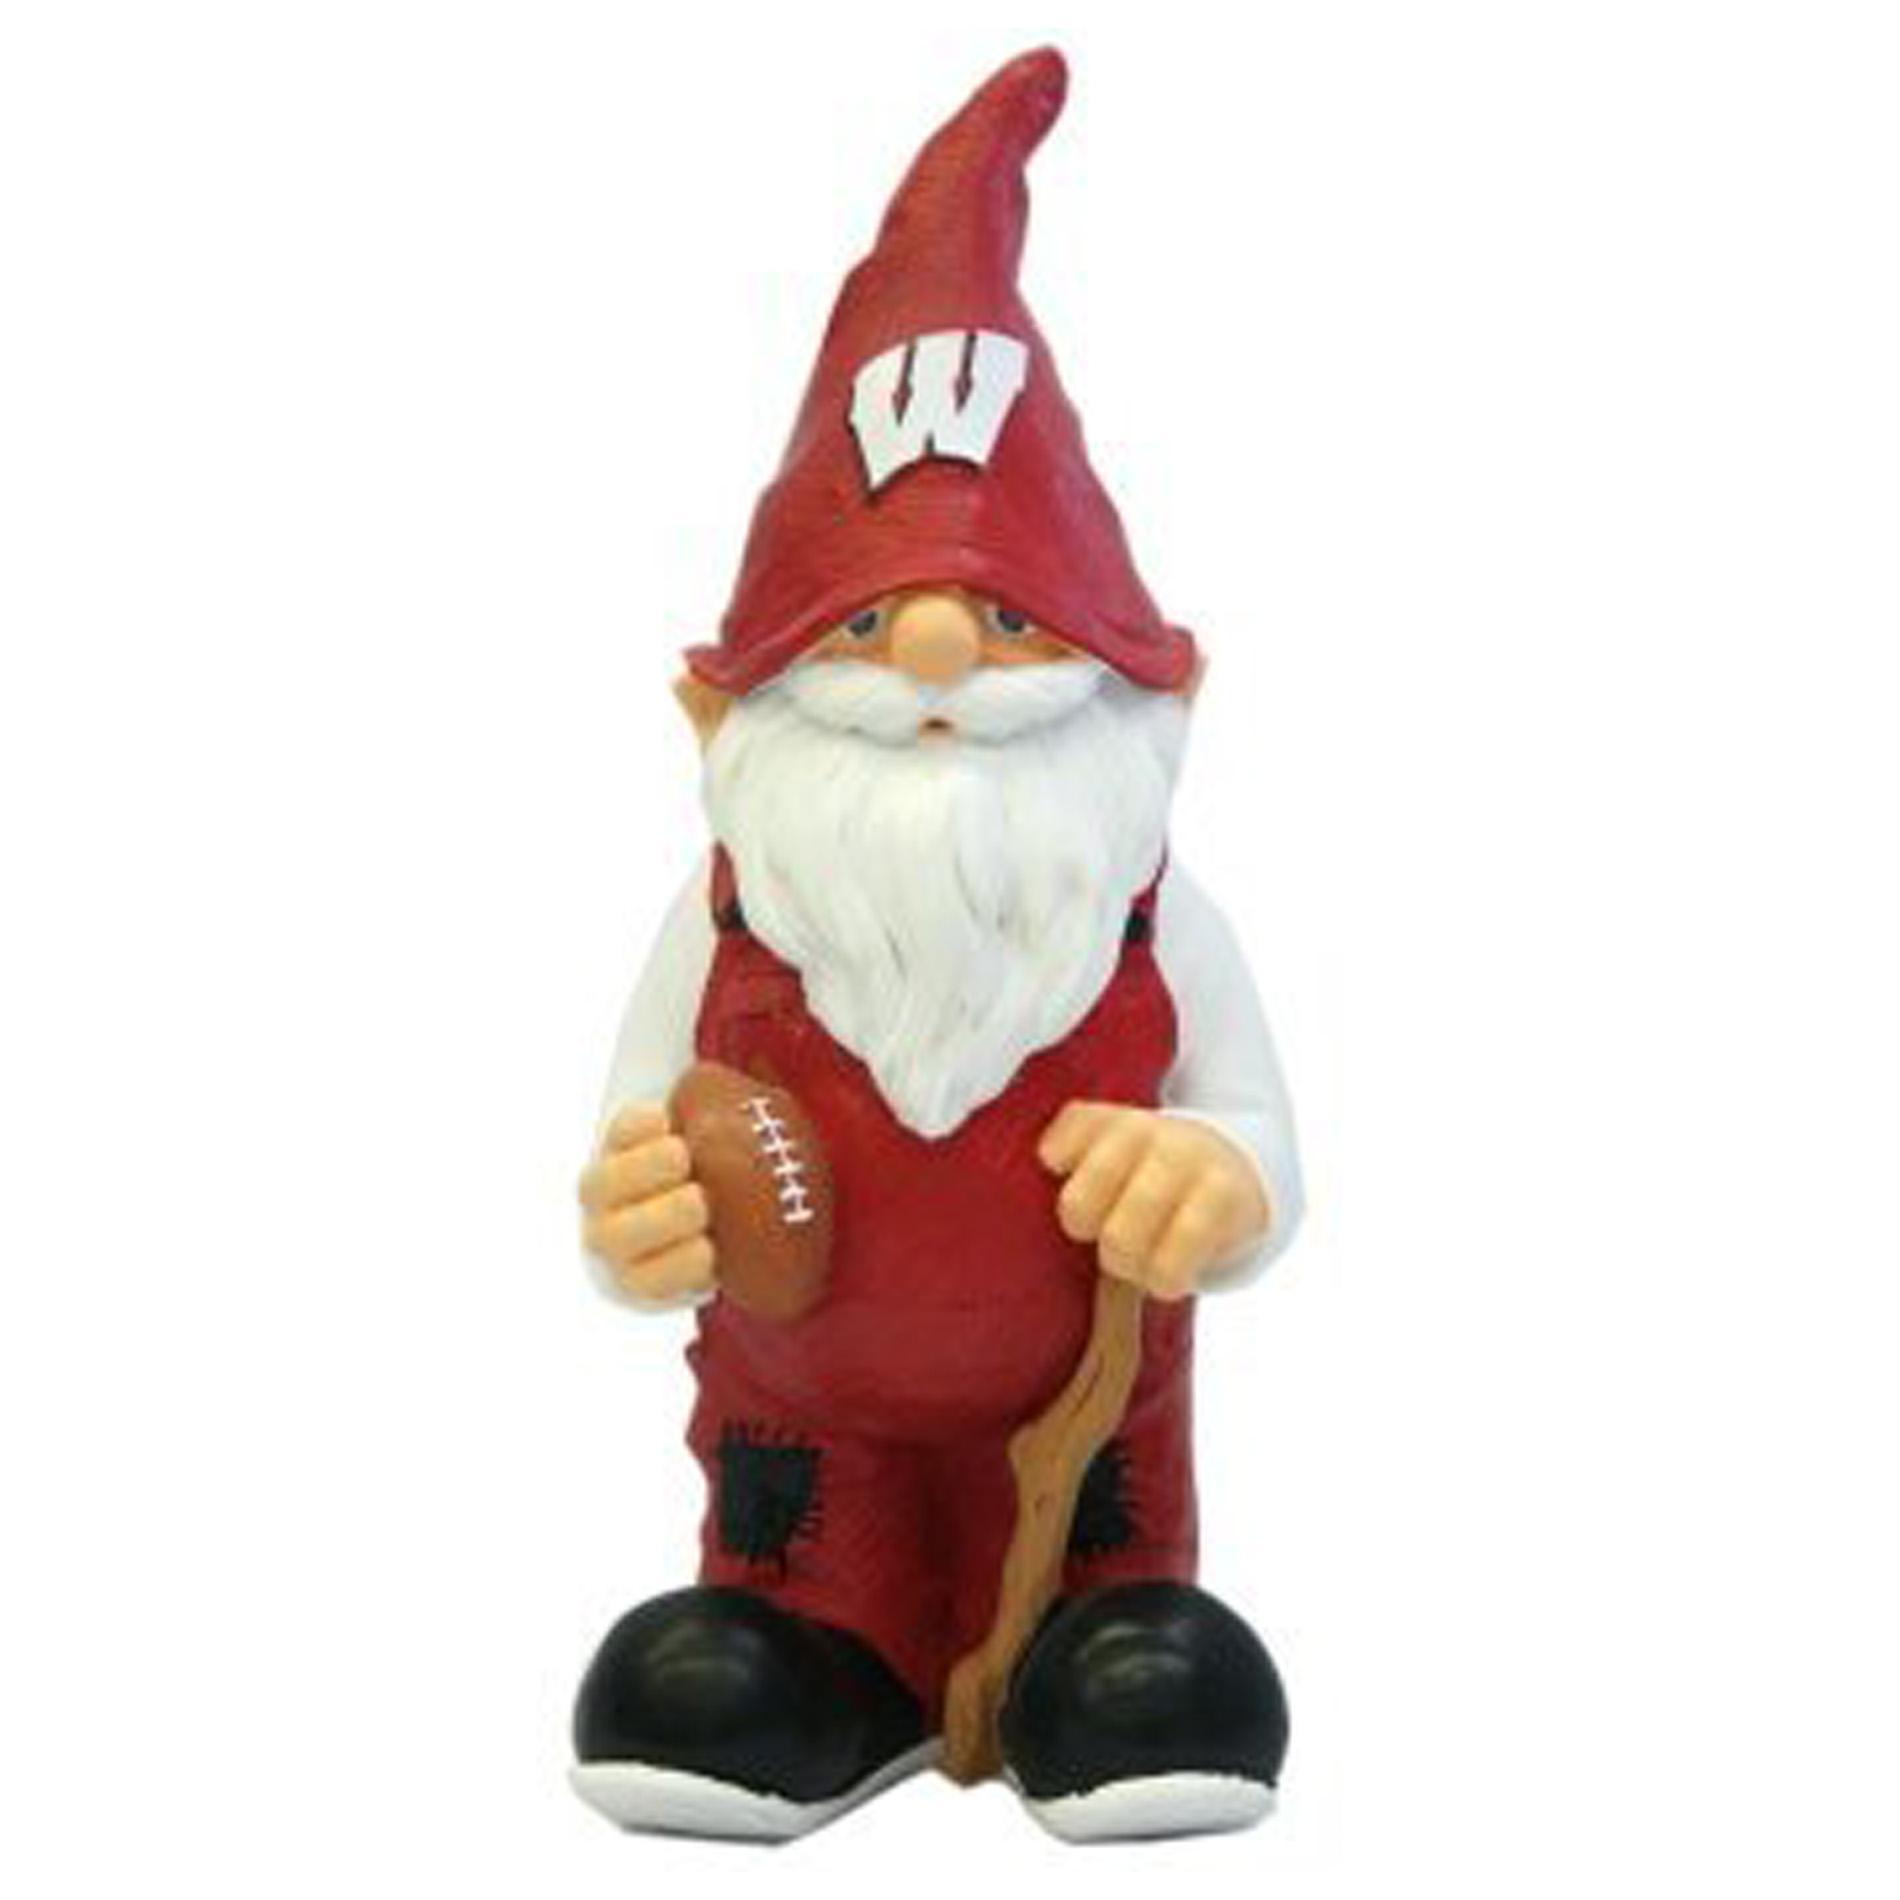 Wisconsin Badgers 11-inch Garden Gnome